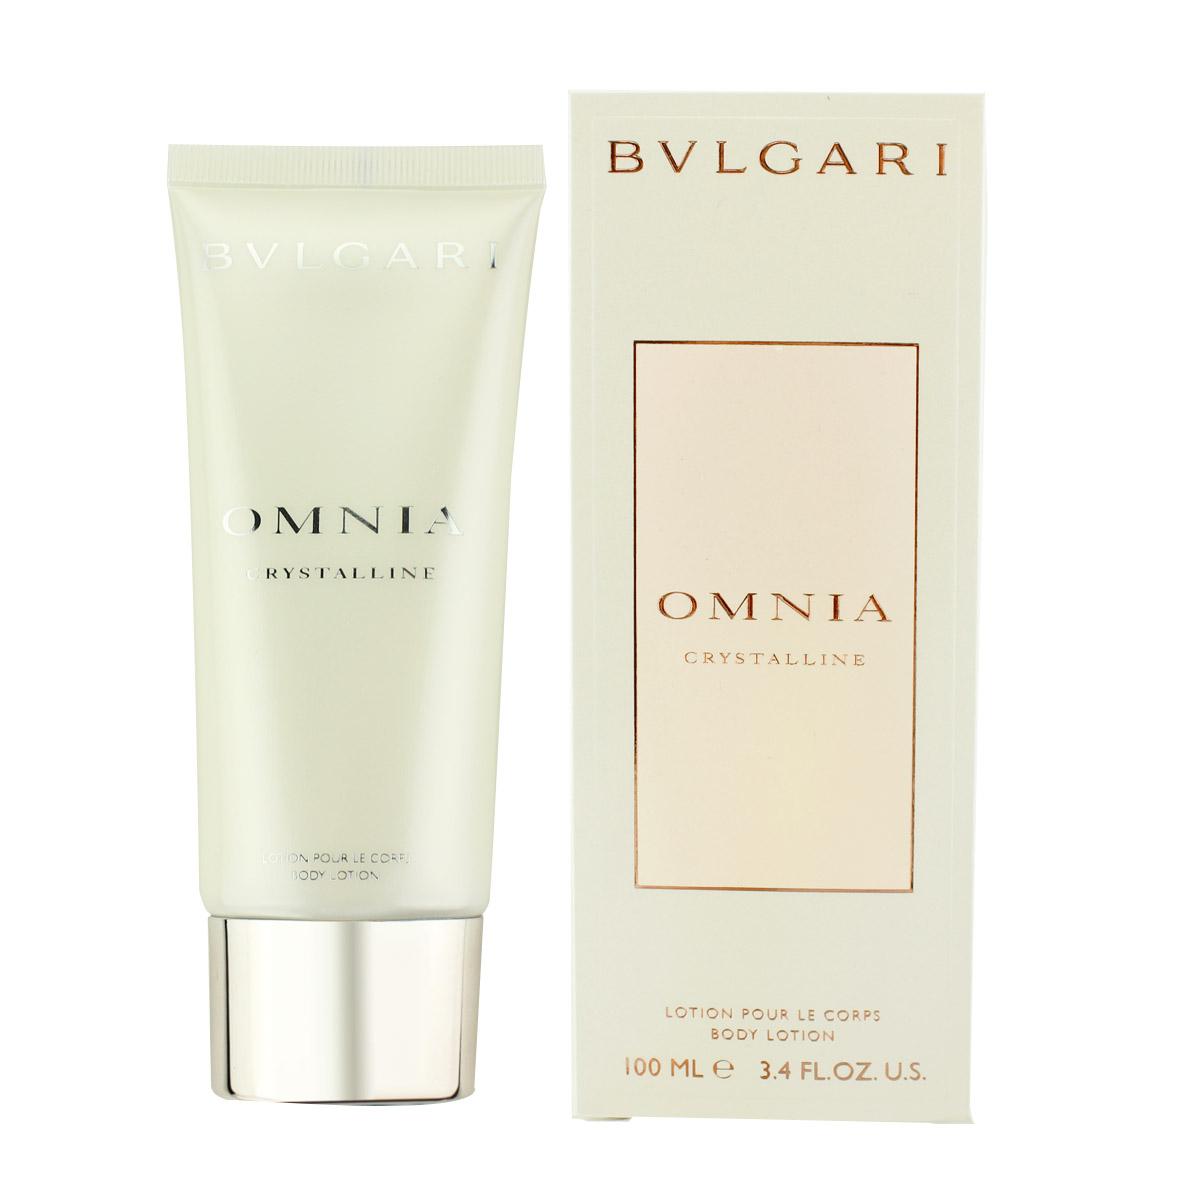 Bvlgari Omnia Crystalline BL 100 ml W